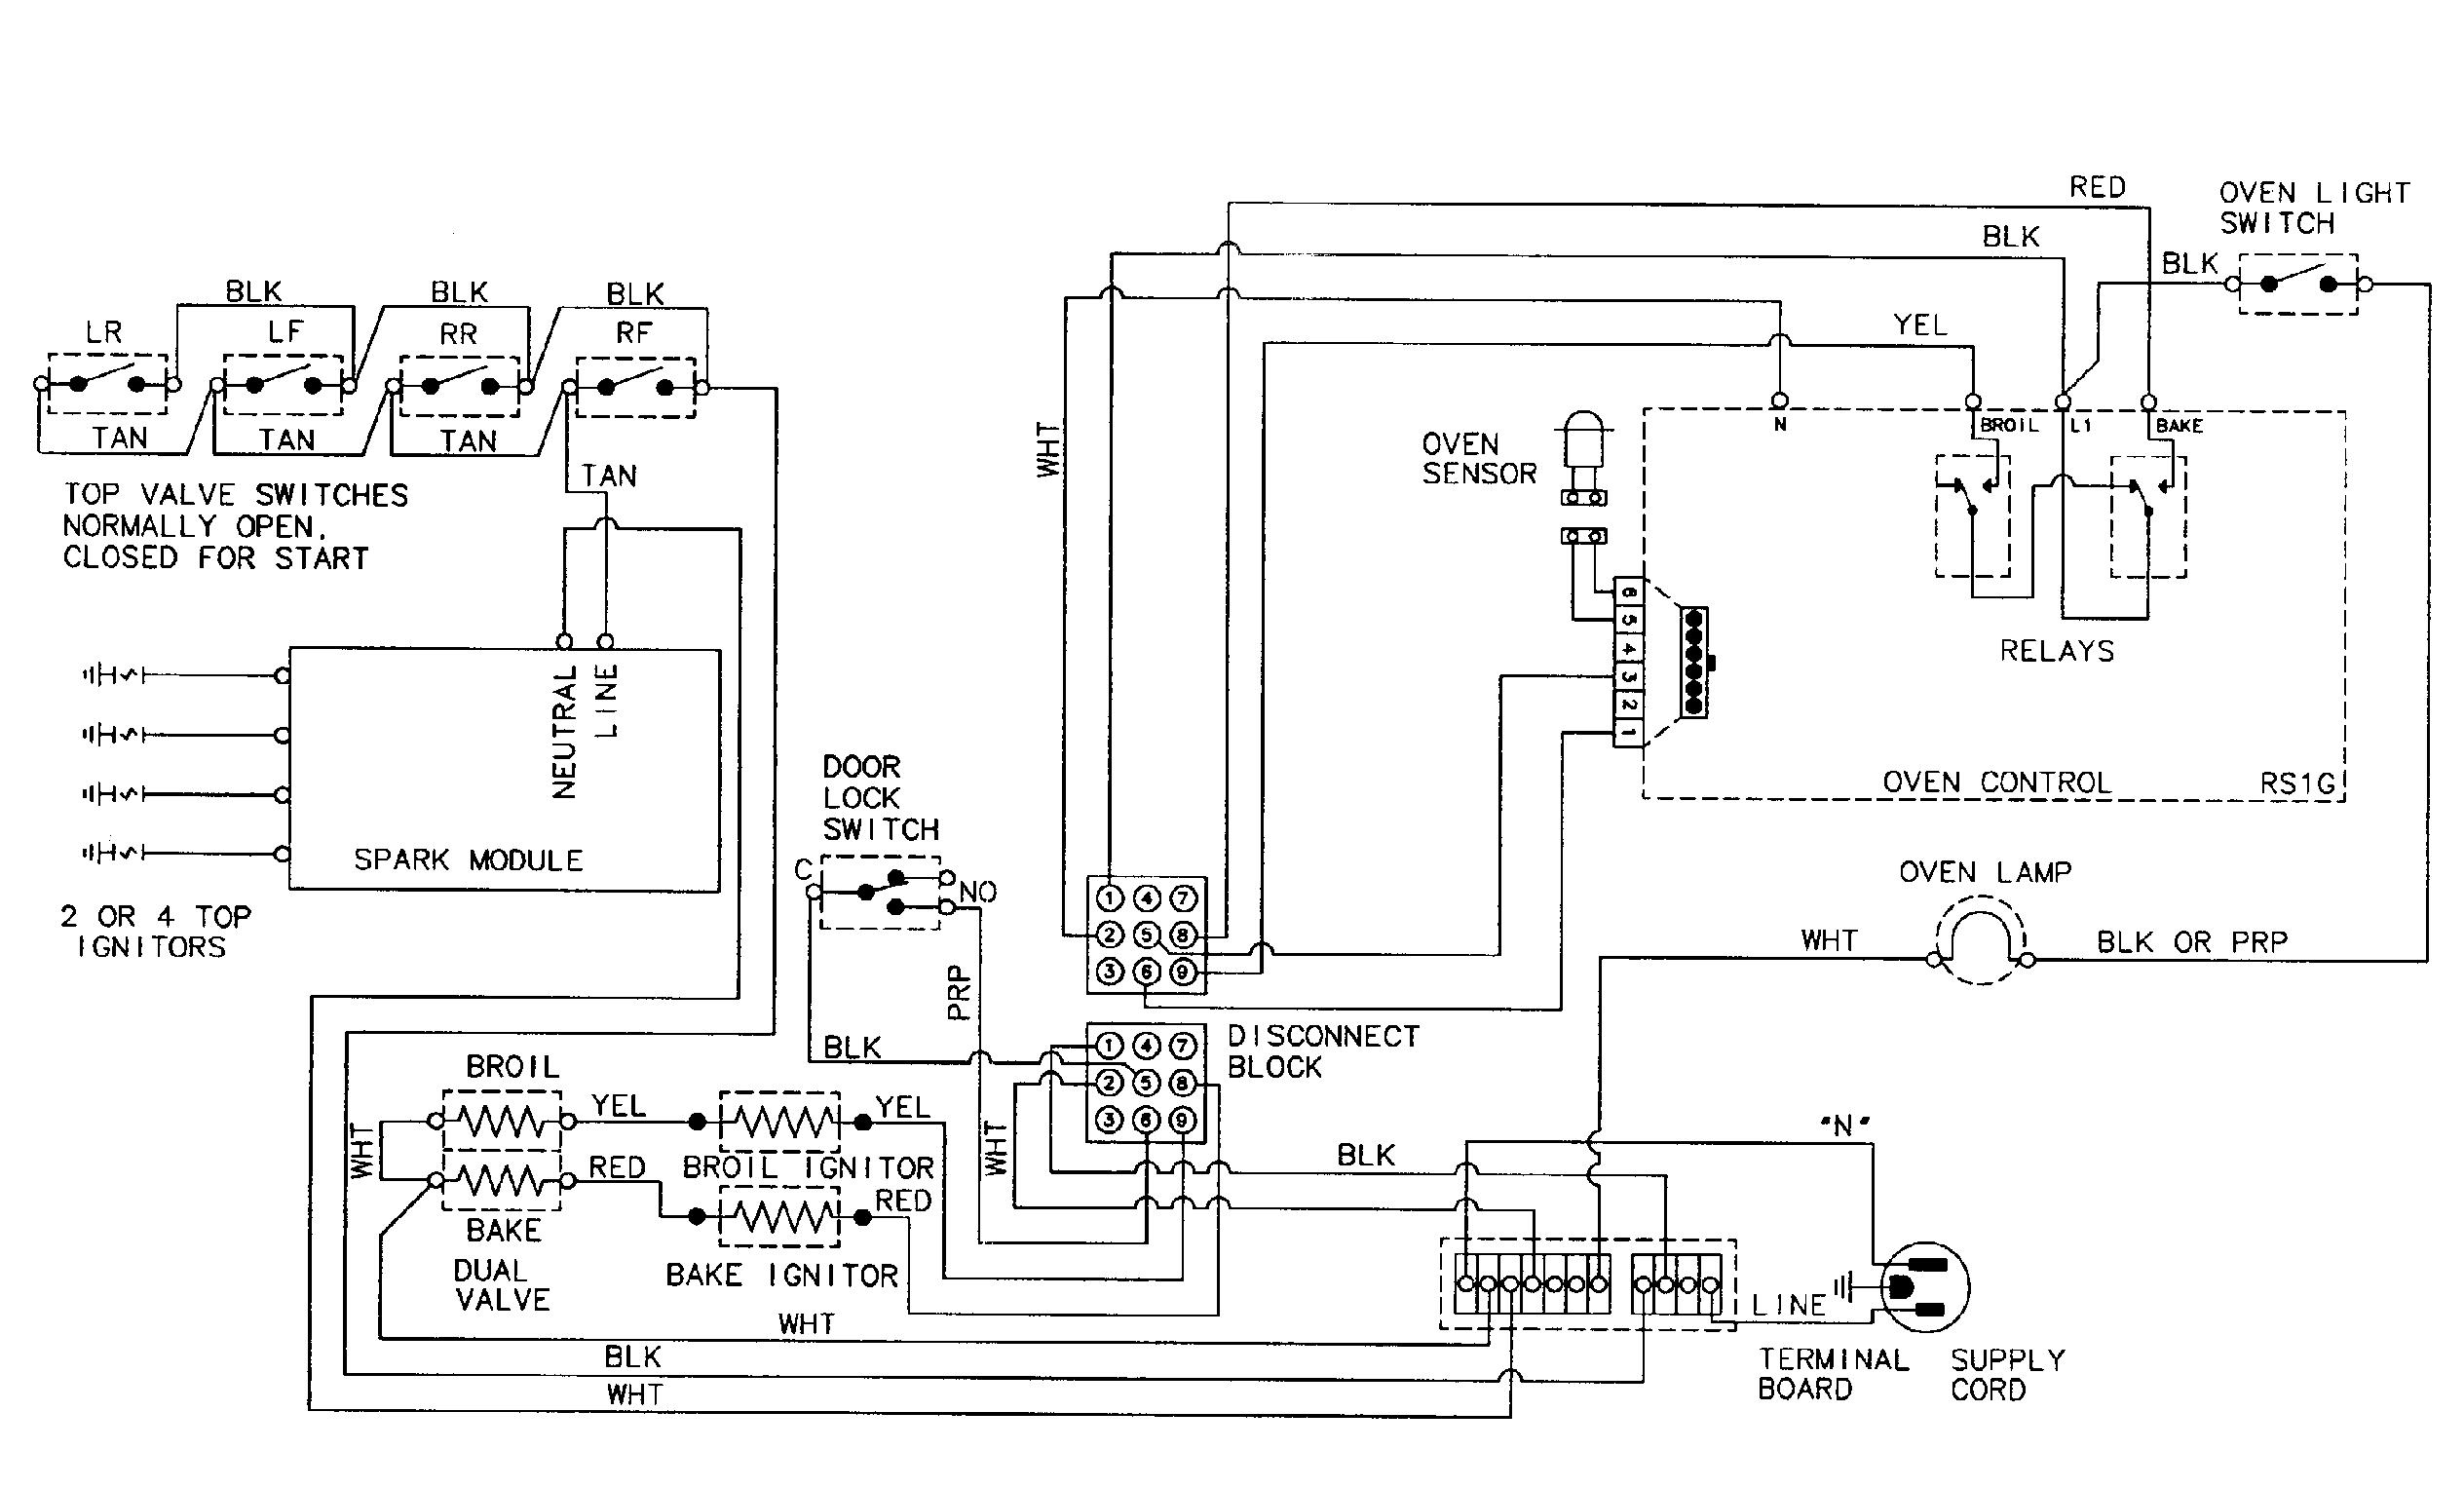 Maytag model MGR5729ADW free standing, gas genuine parts